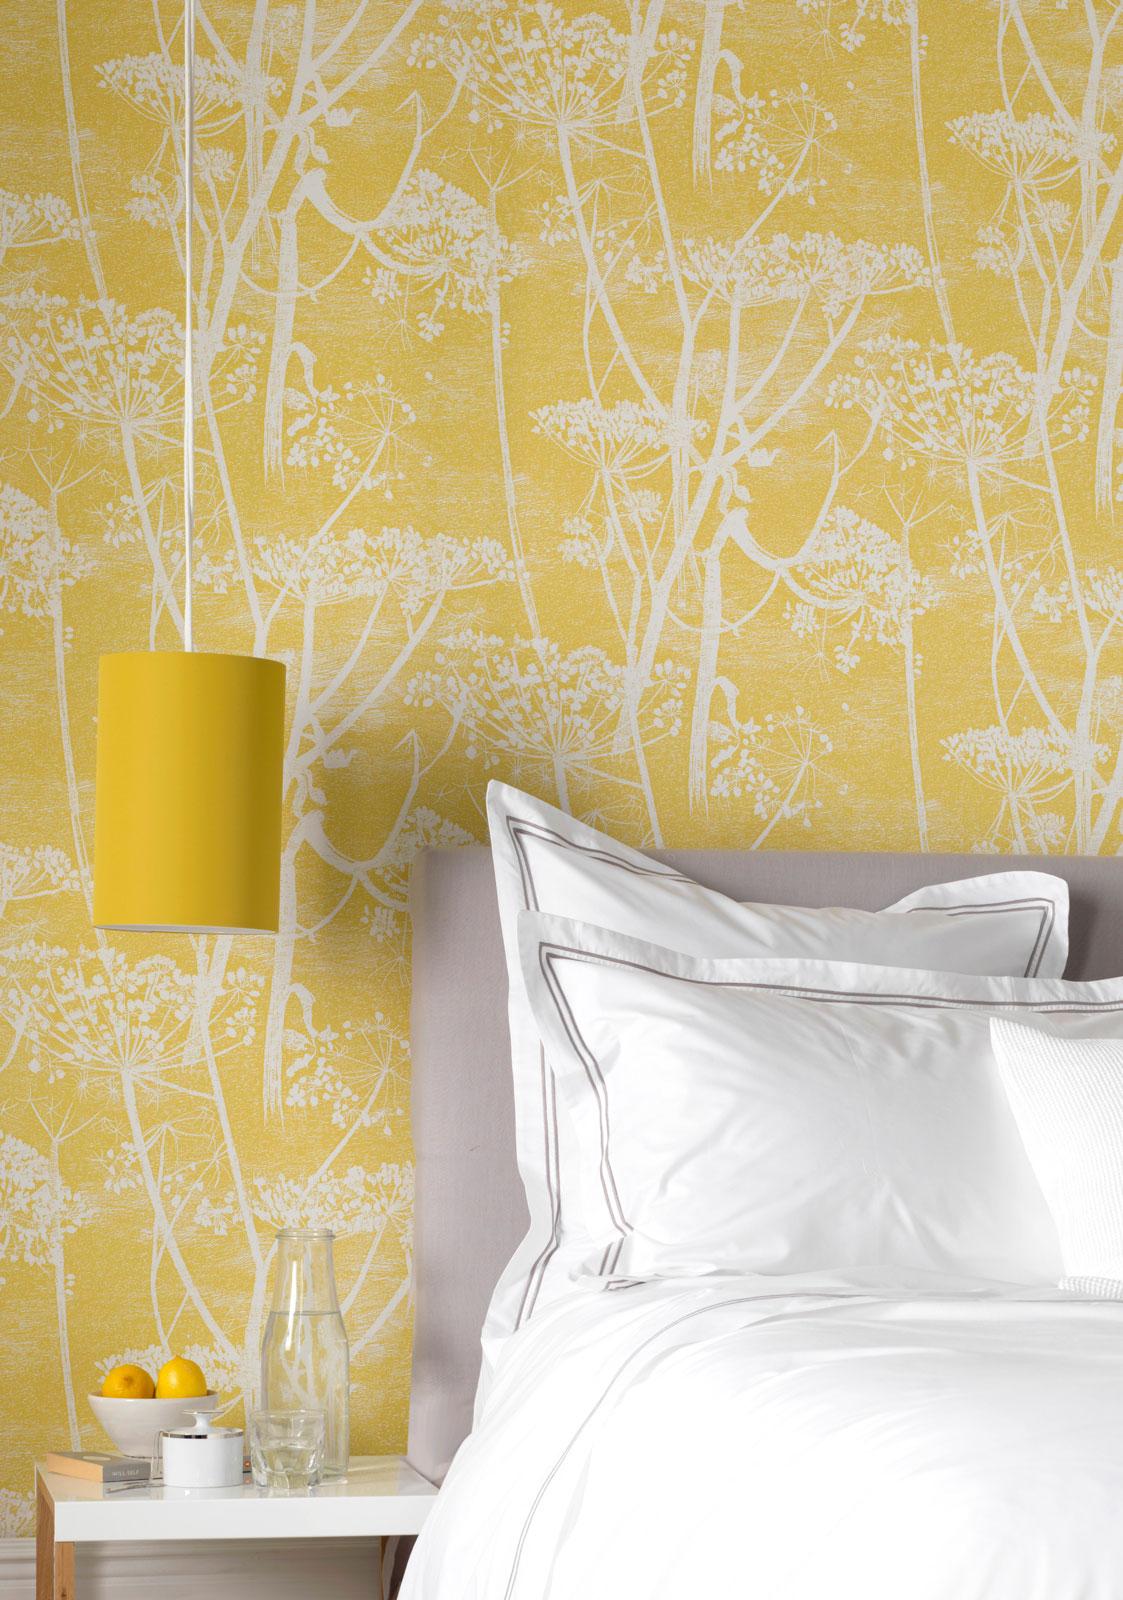 Желтые обои с белым рисунком